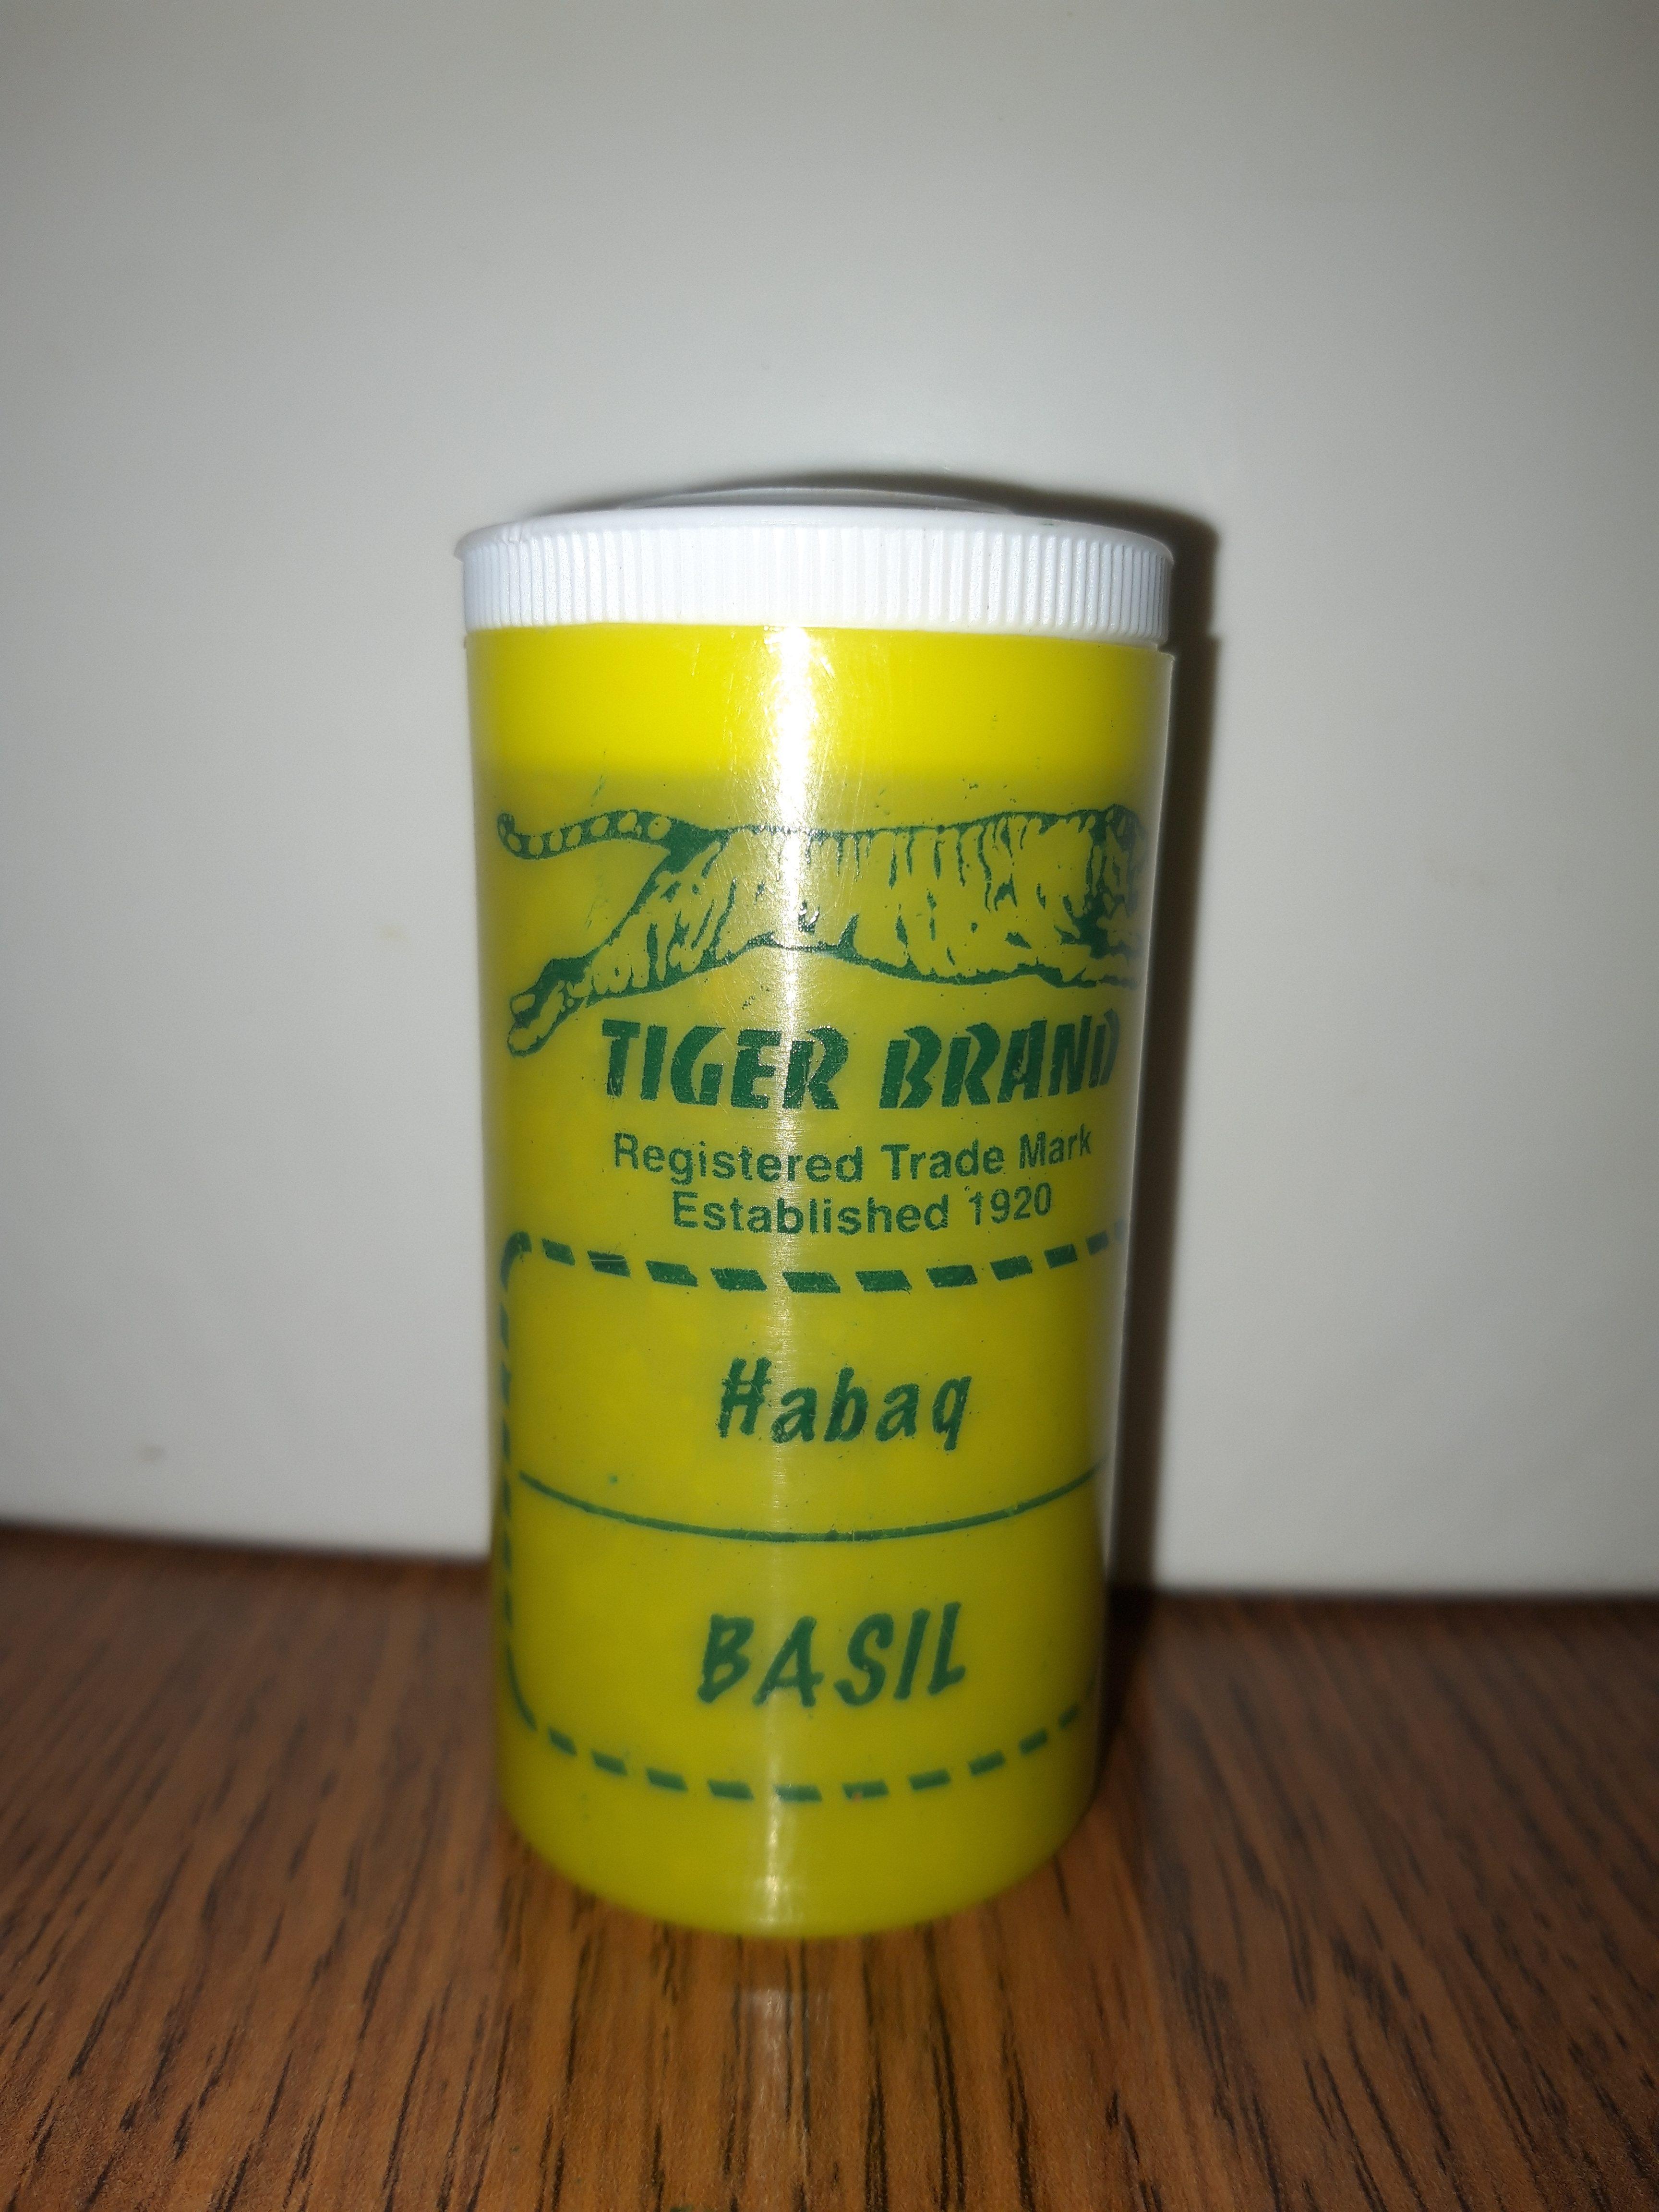 TIGER BRAND BASIL